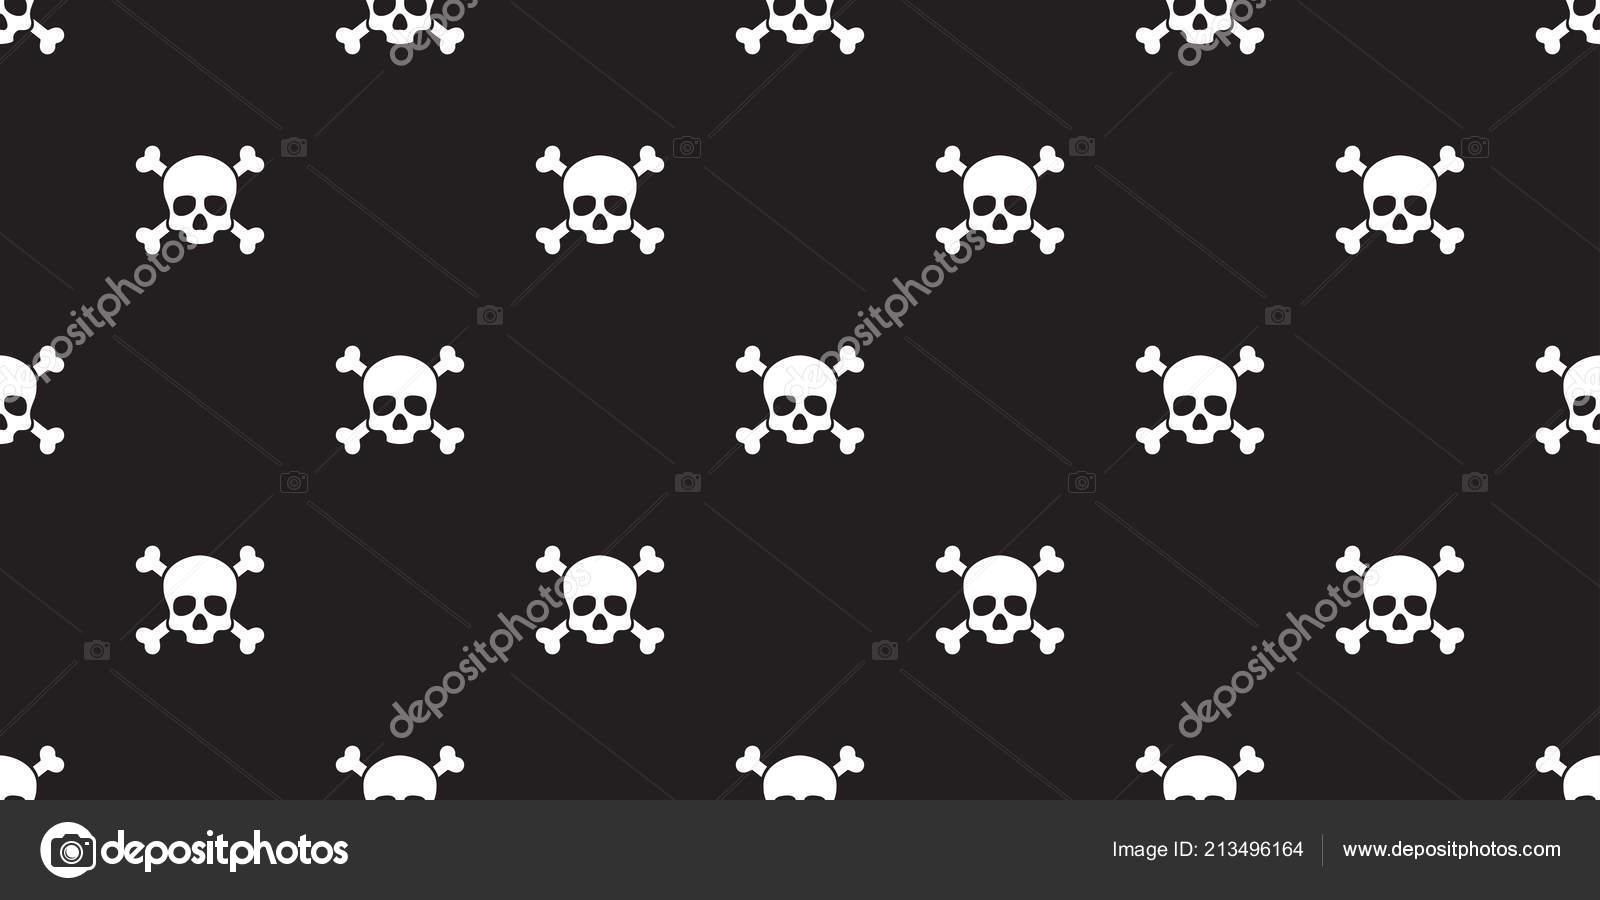 Pirate Skull Wallpaper Pirate Skull Seamless Pattern